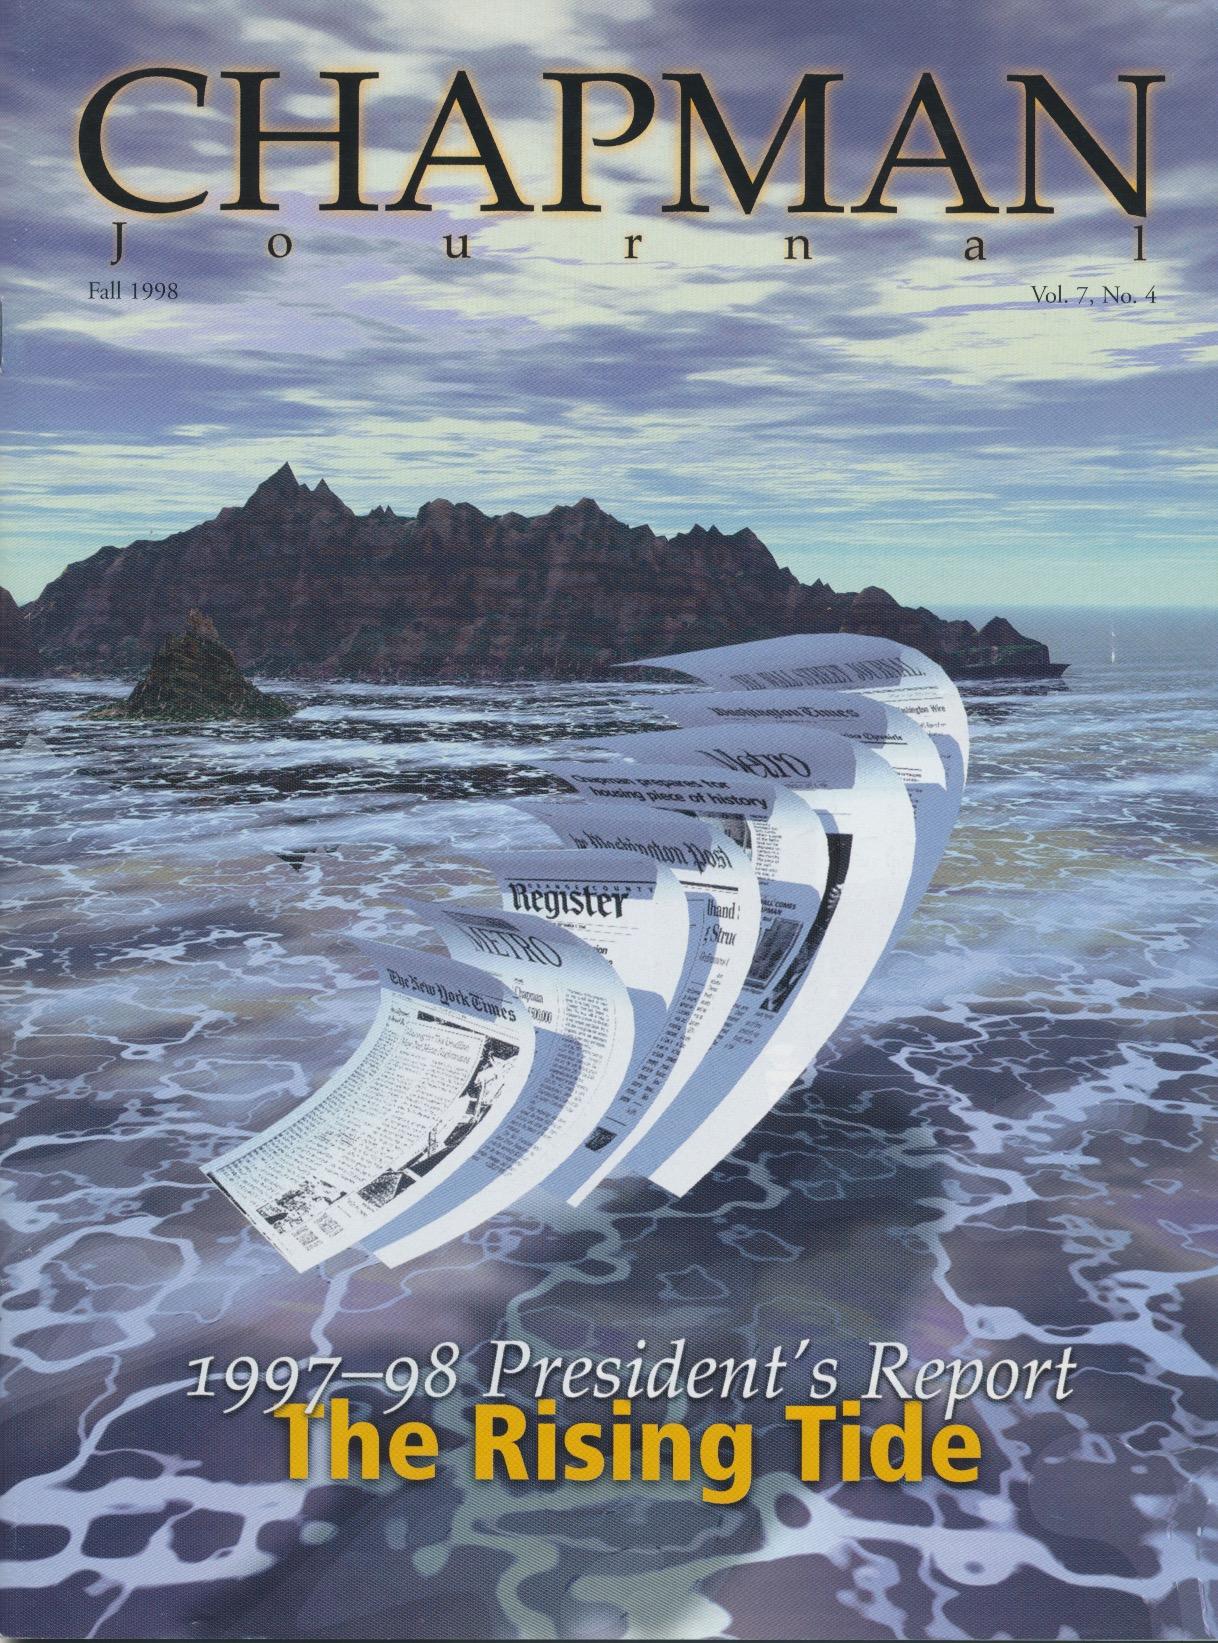 Chapman Journal cover illustration